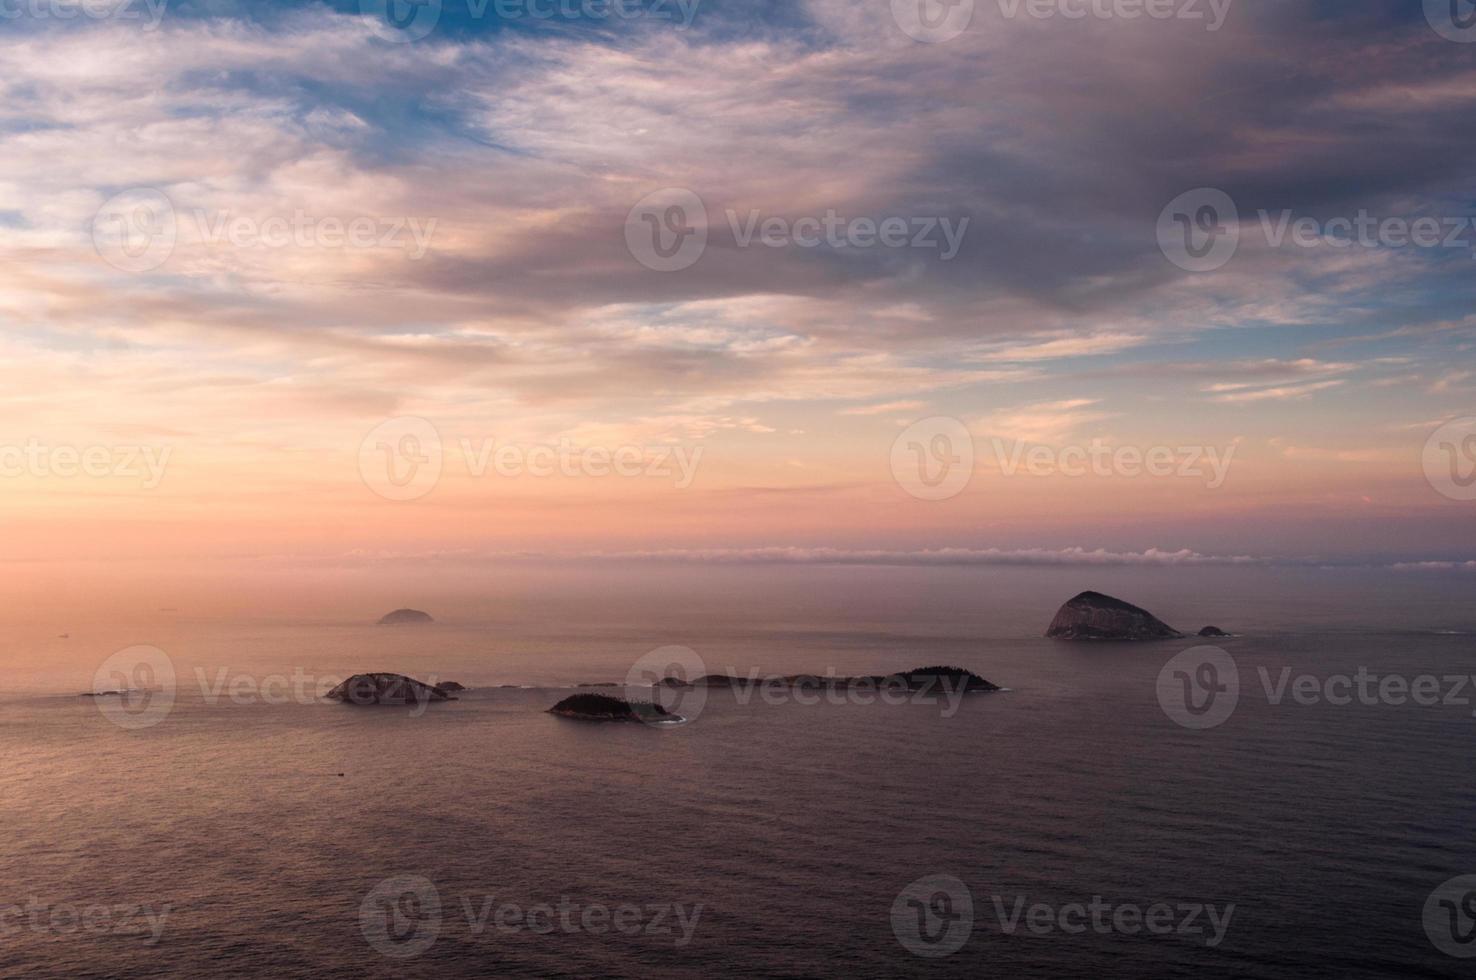 Meerblick bei Sonnenaufgang mit Inseln am Horizont foto